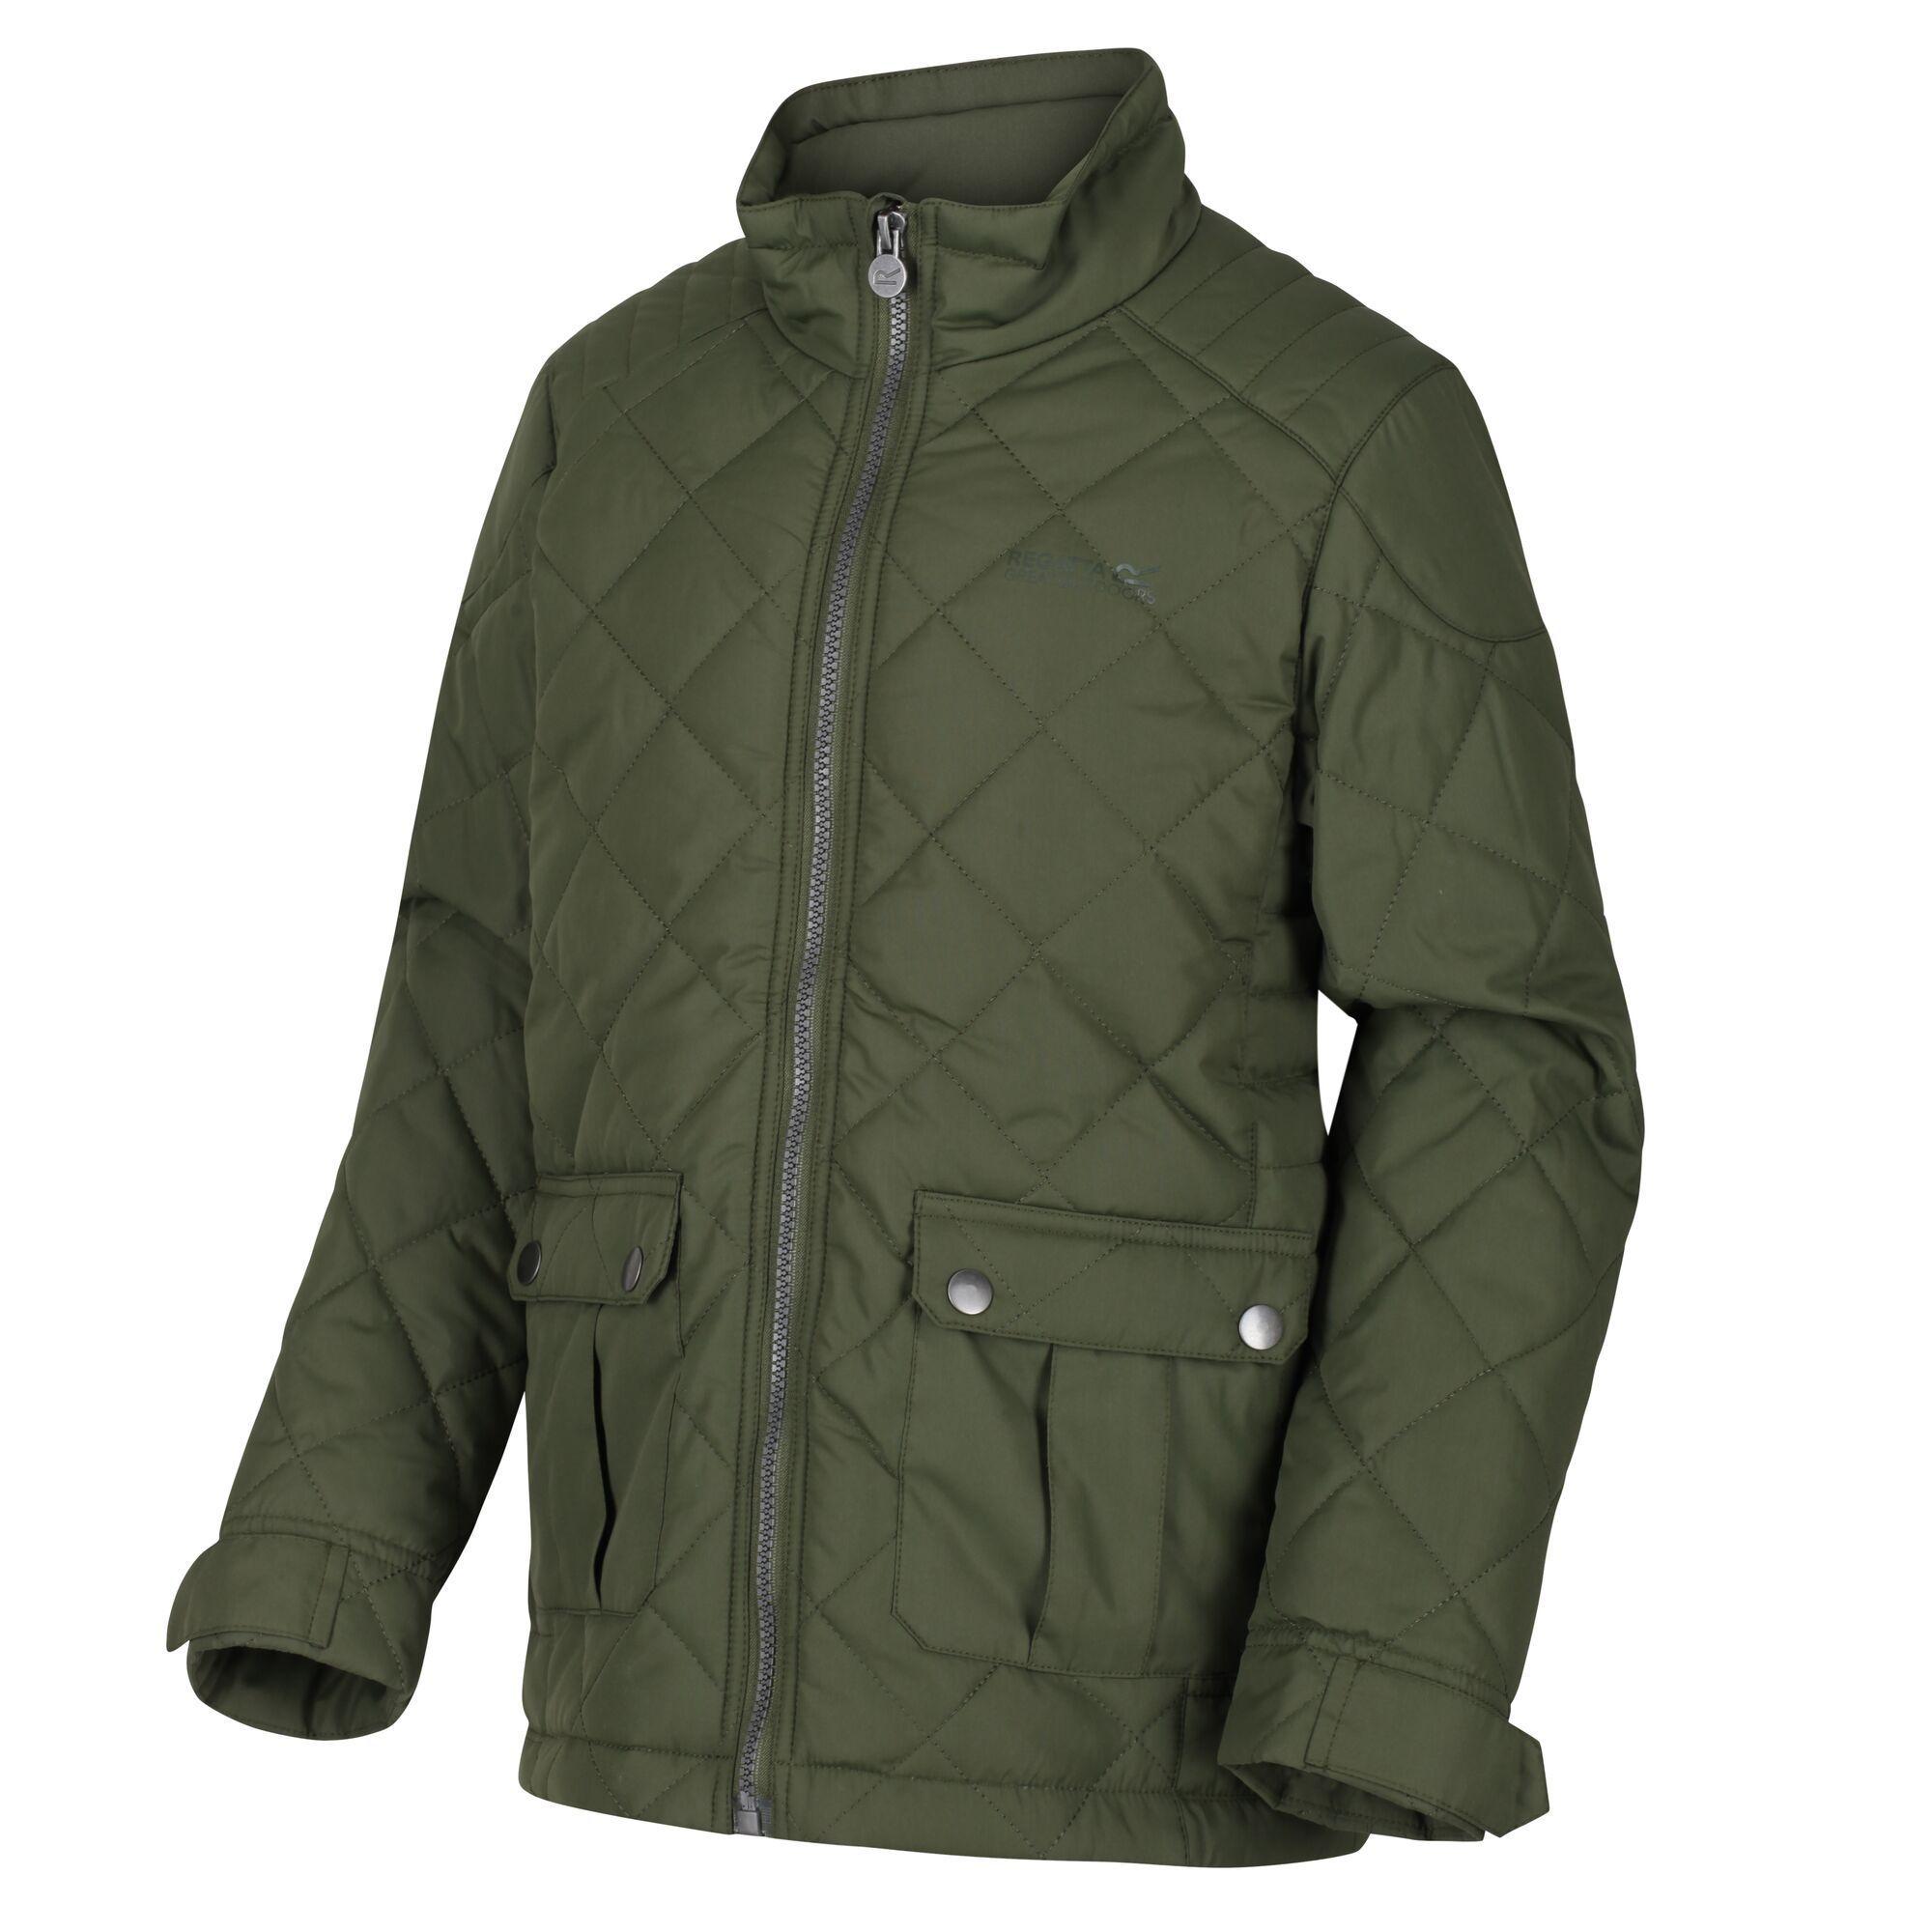 Regatta Childrens/Kids Zion Quilted Insulated Jacket (Racing Green)